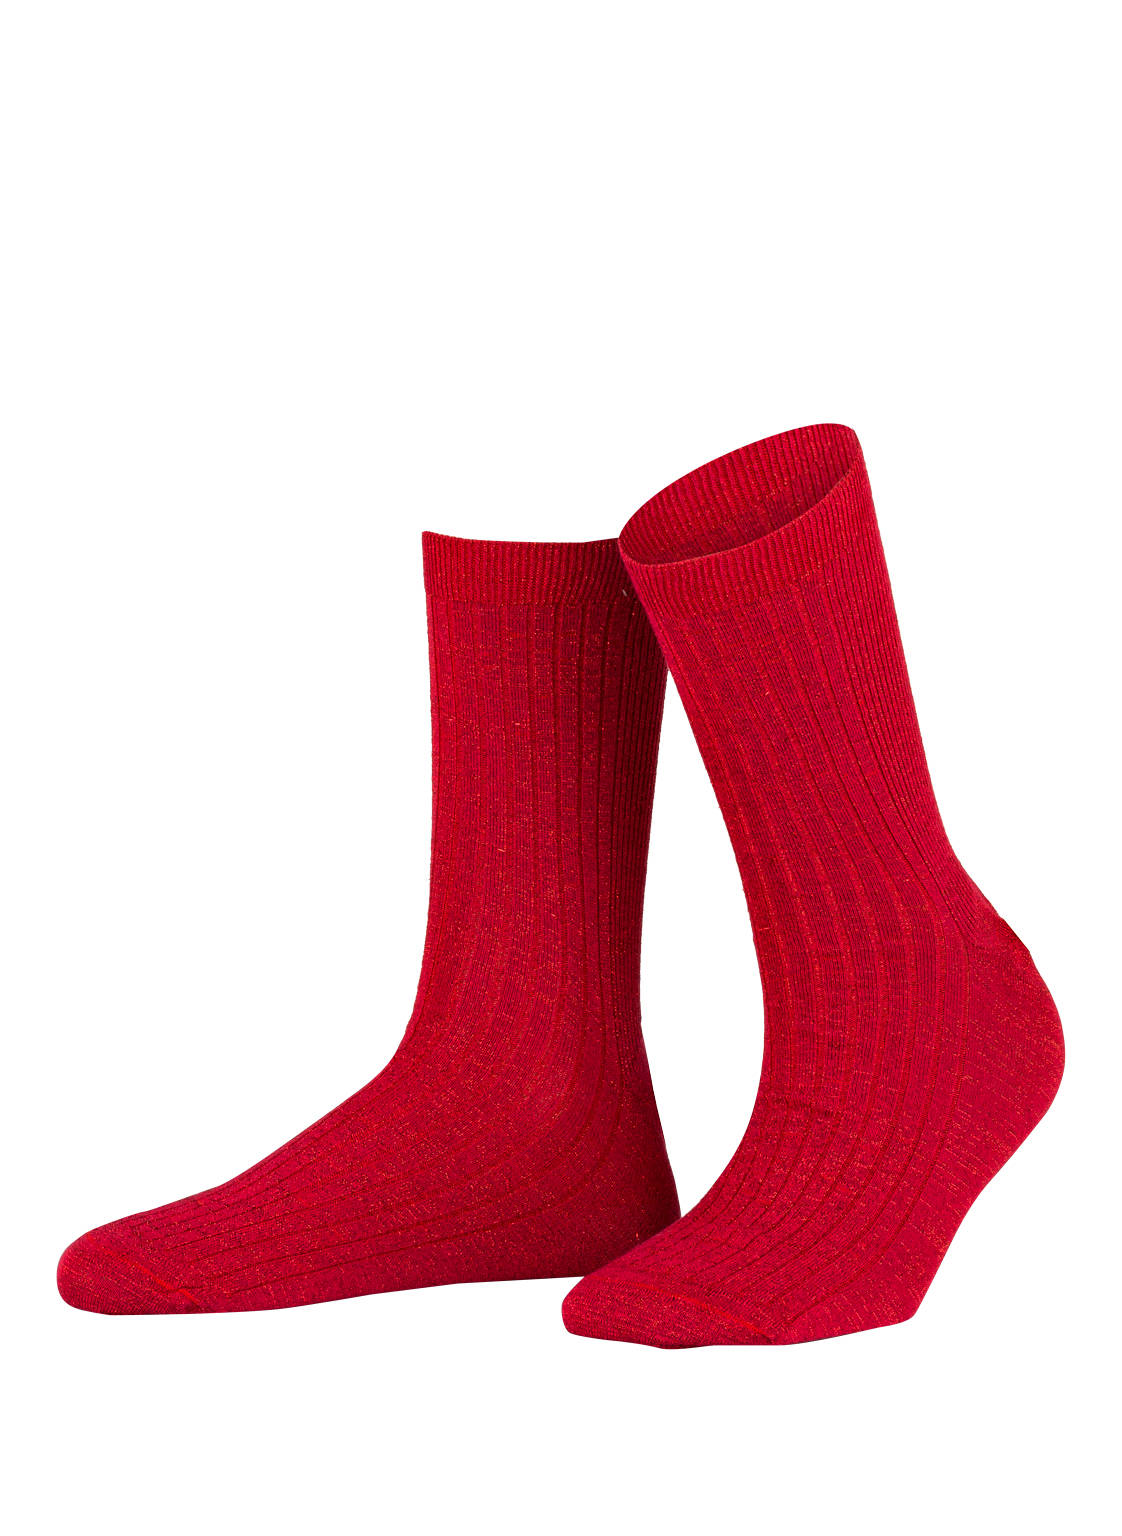 Image of Alto Milano Socken rot